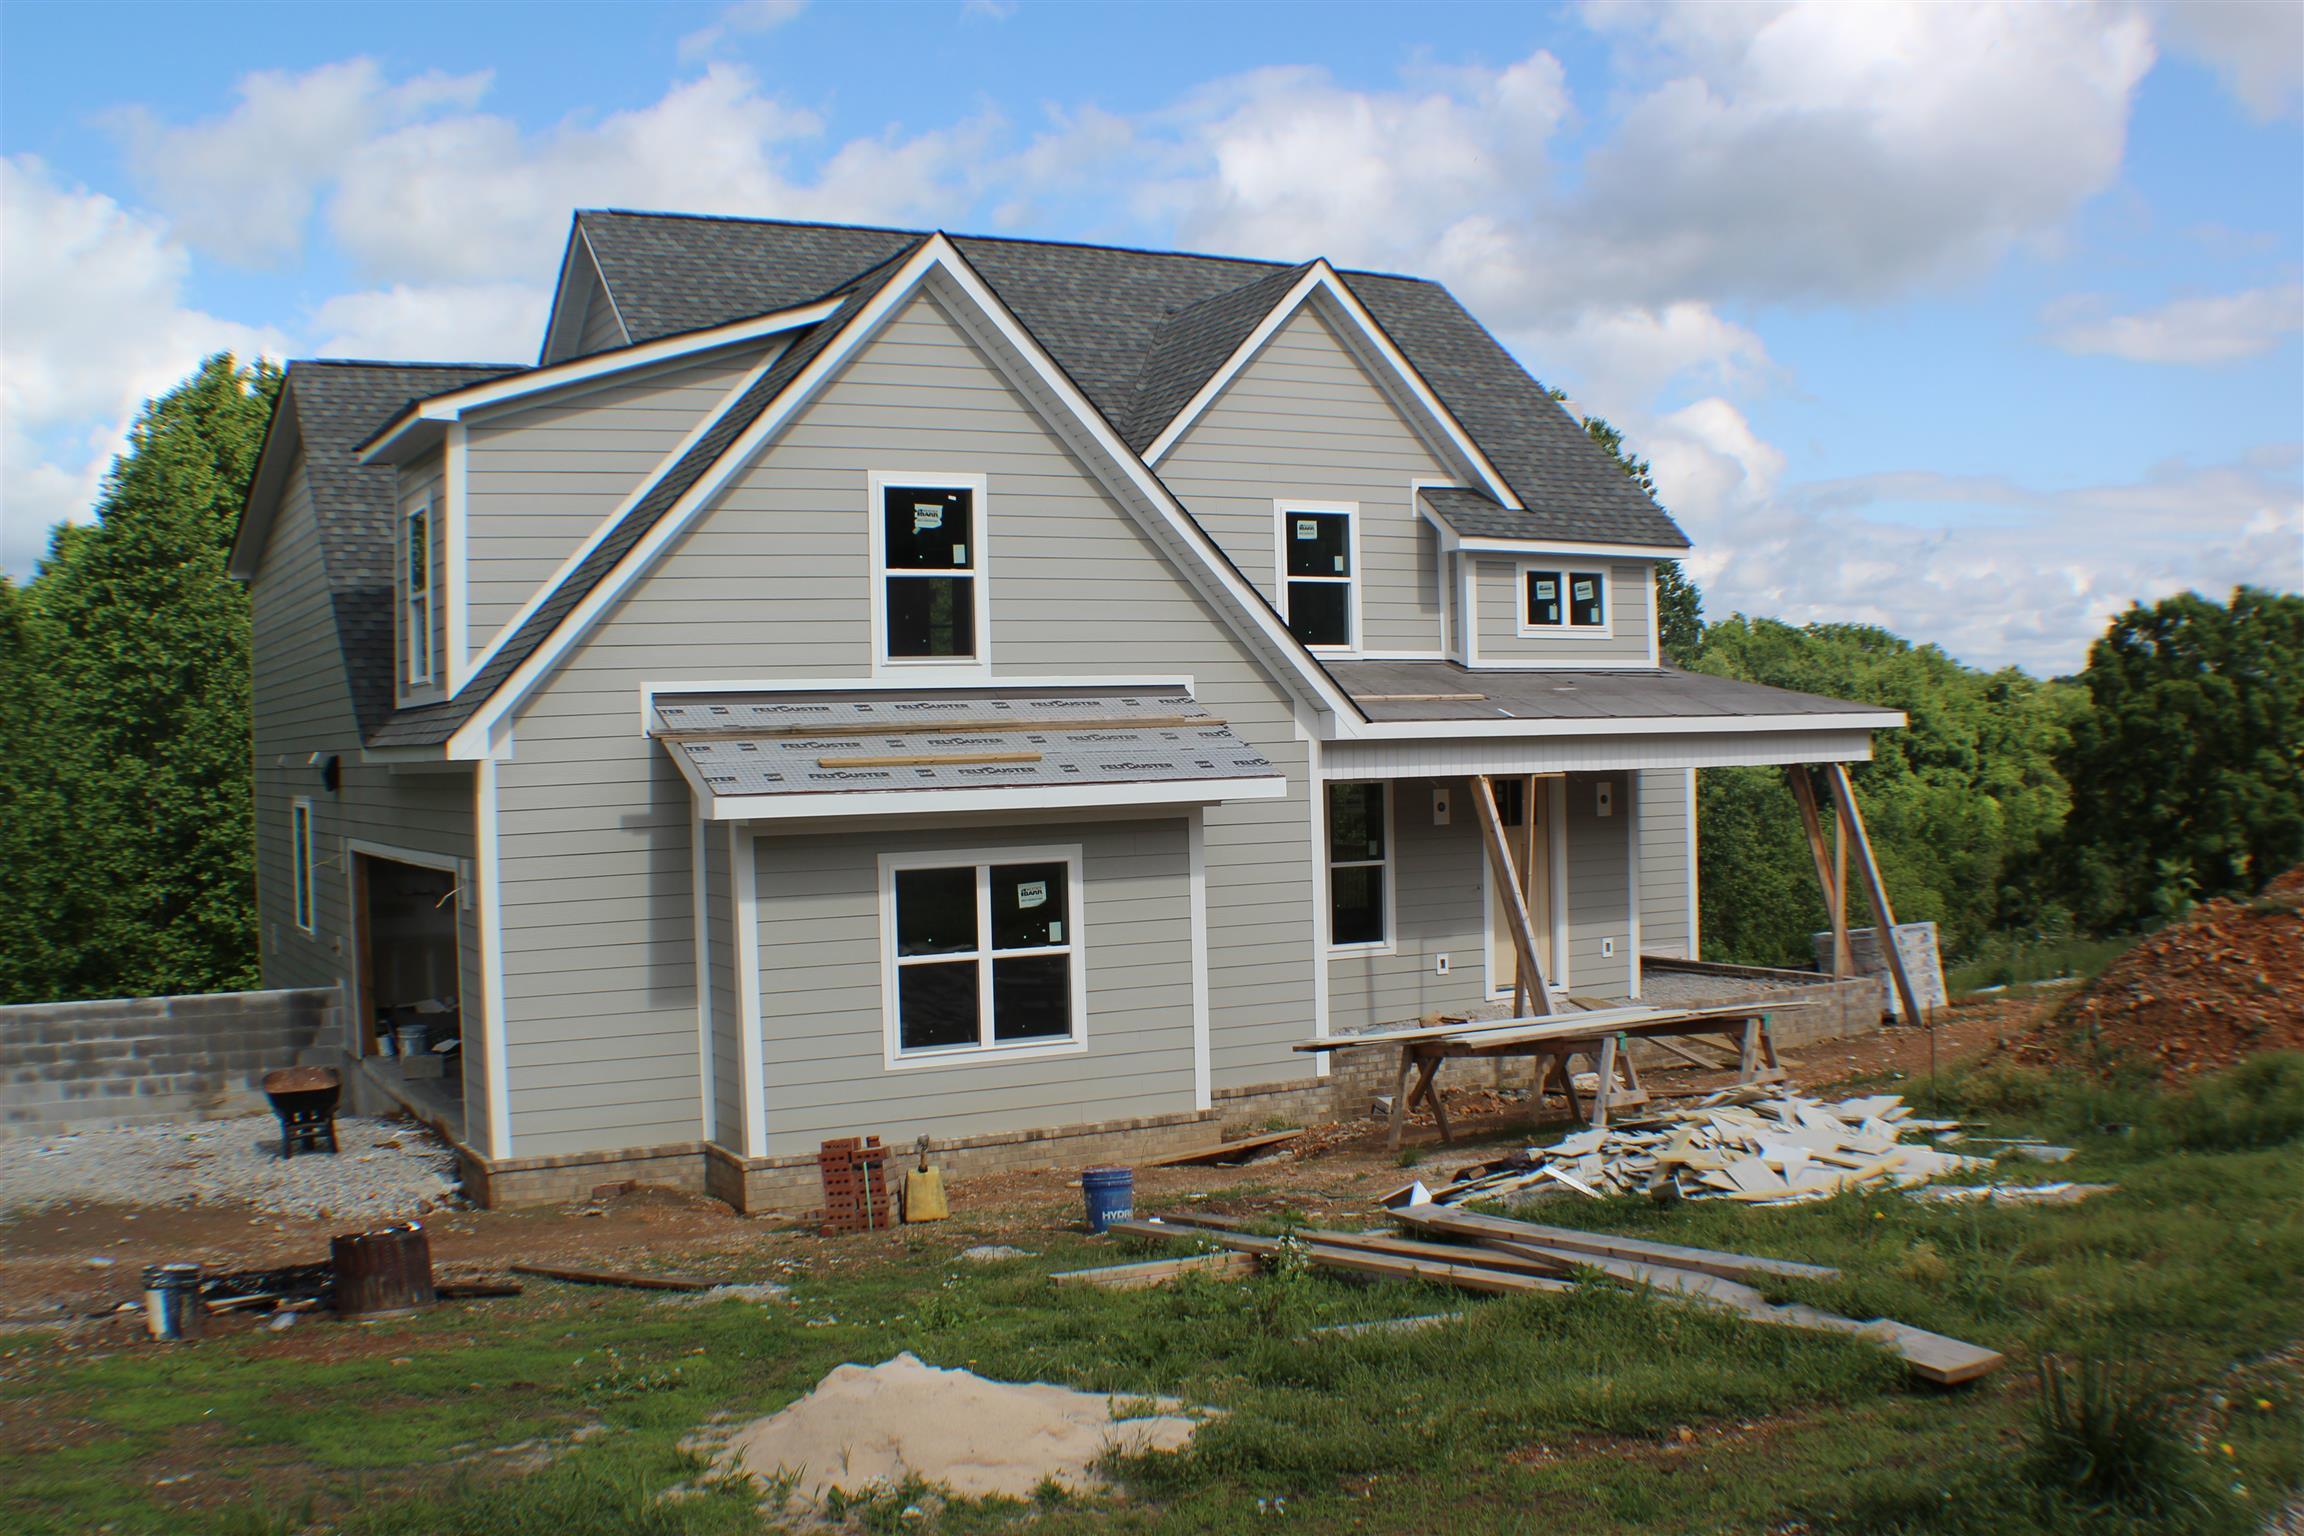 621 Lakehaven Dr, Tullahoma, TN 37388 - Tullahoma, TN real estate listing